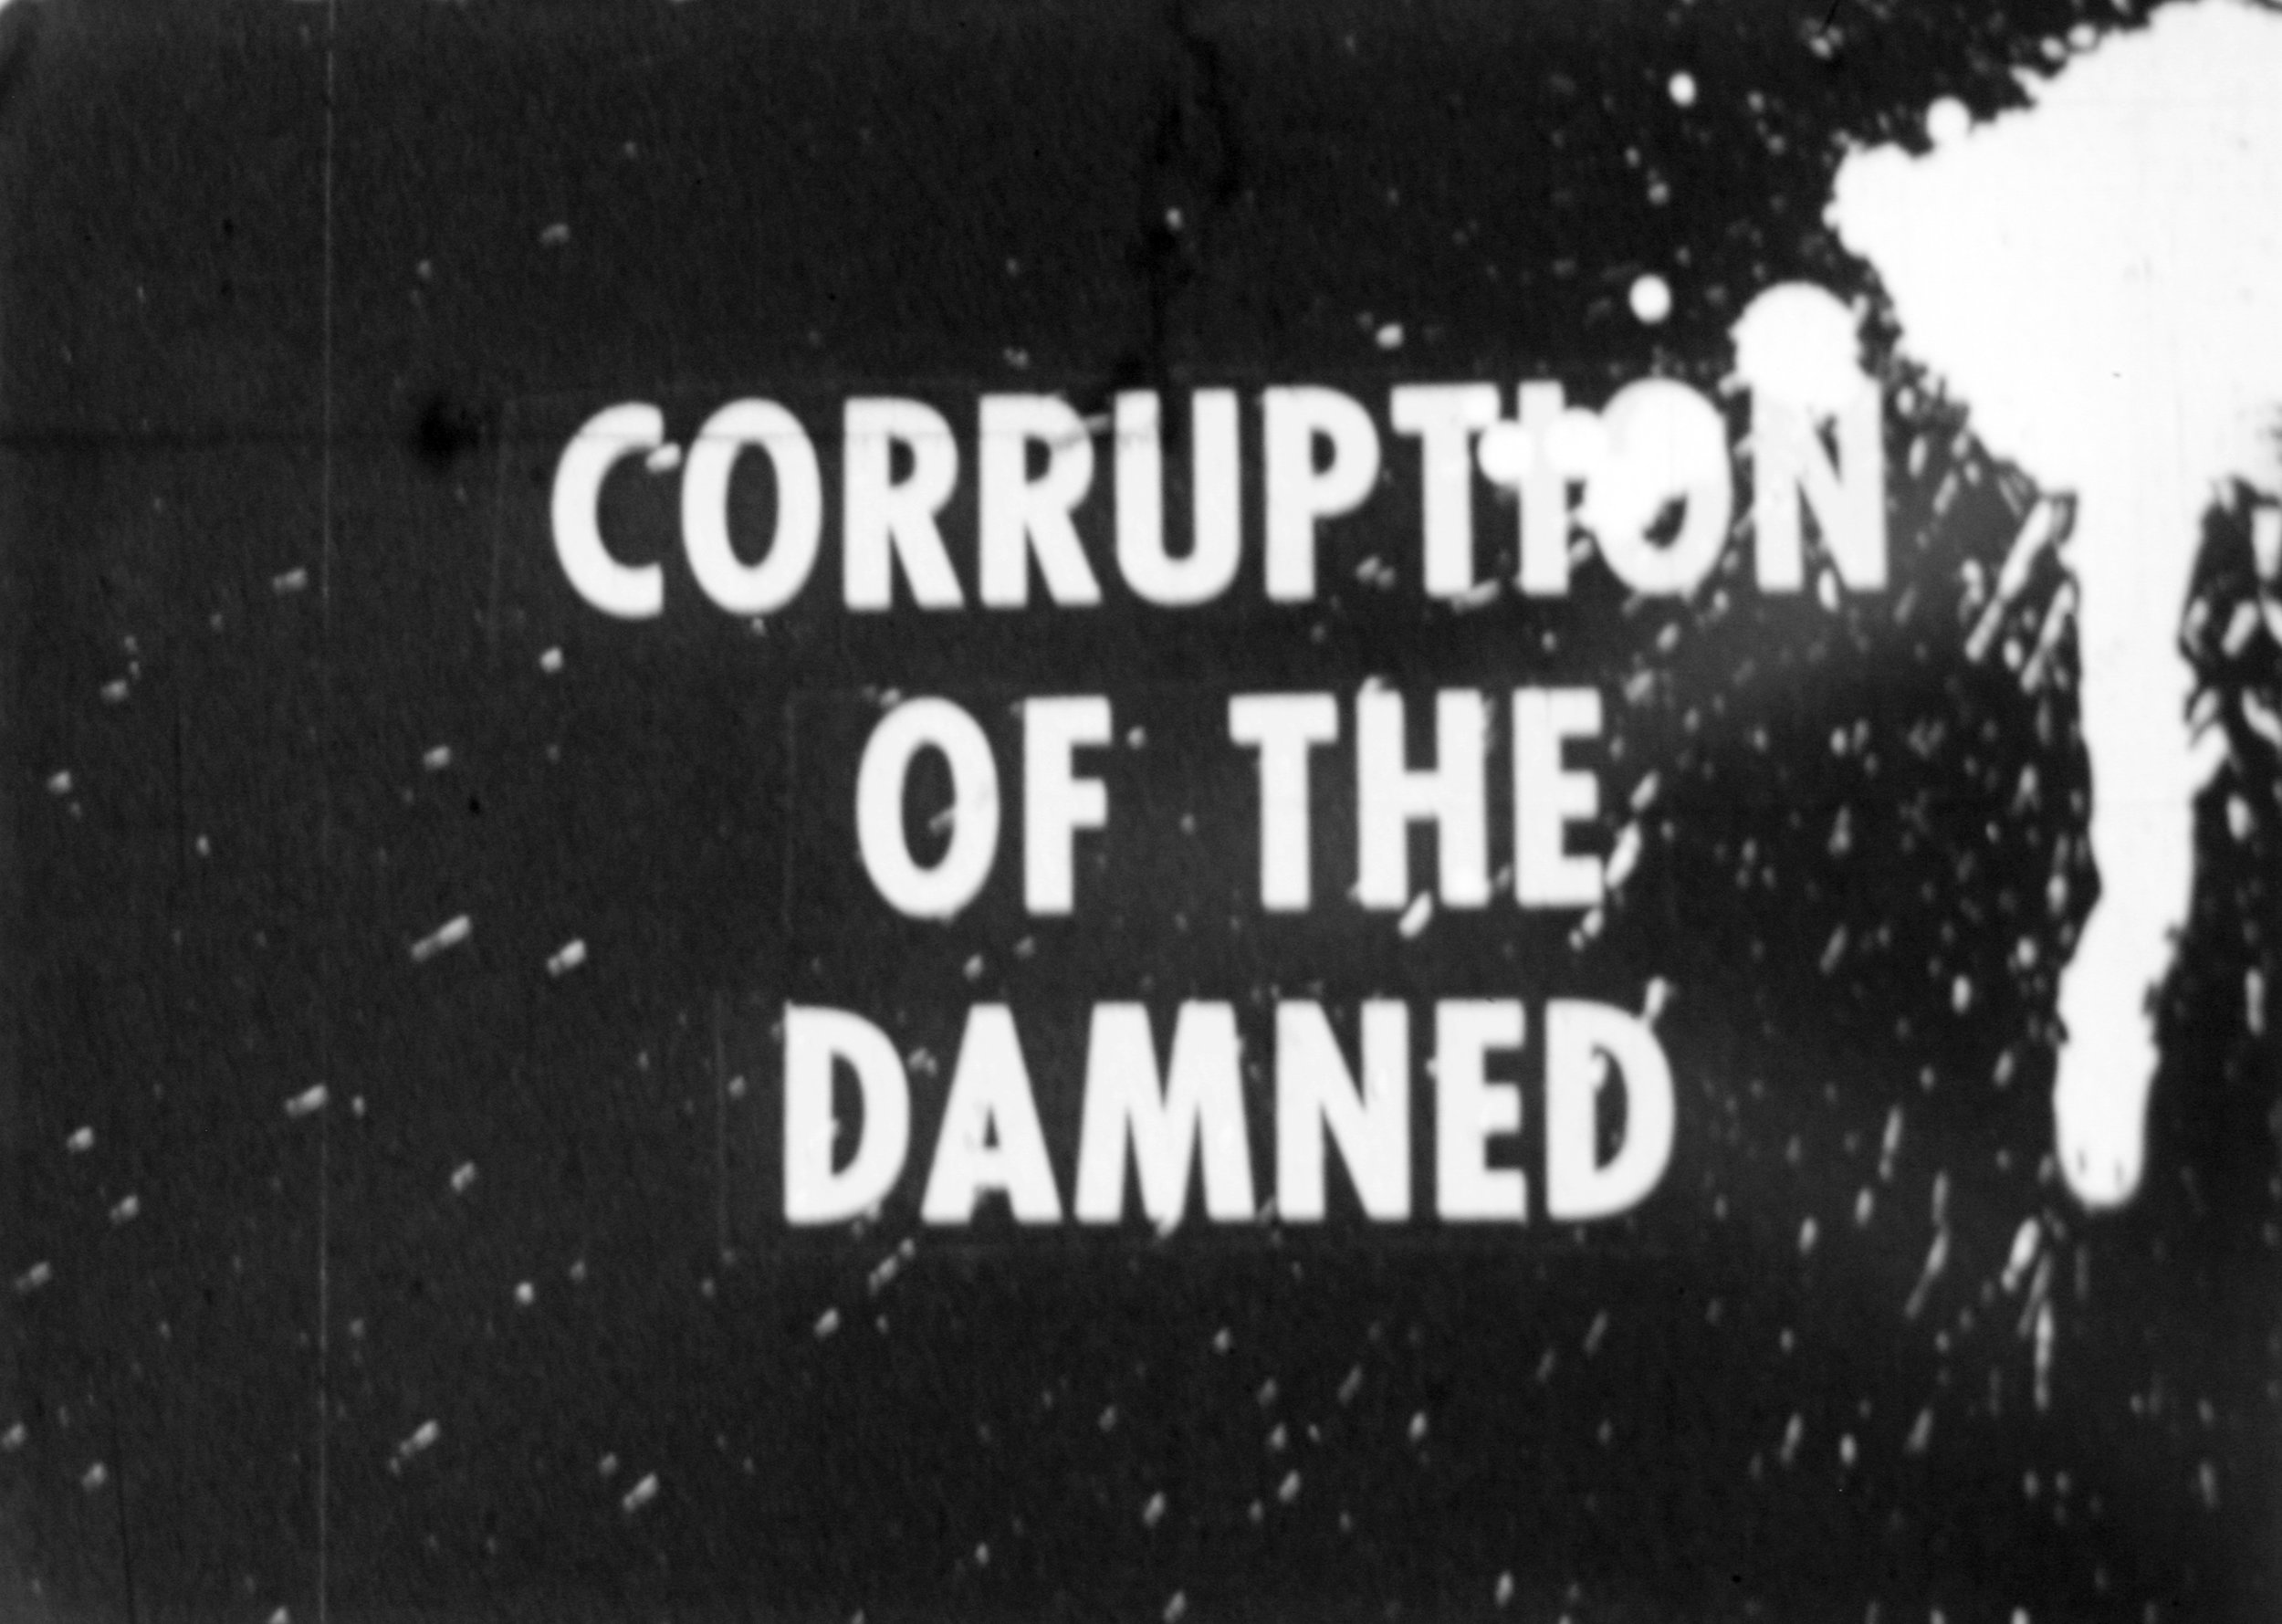 Corruption of the Damned  (1965, 16mm, B&W, Sound, 55min.); © Kuchar Brothers Trust.